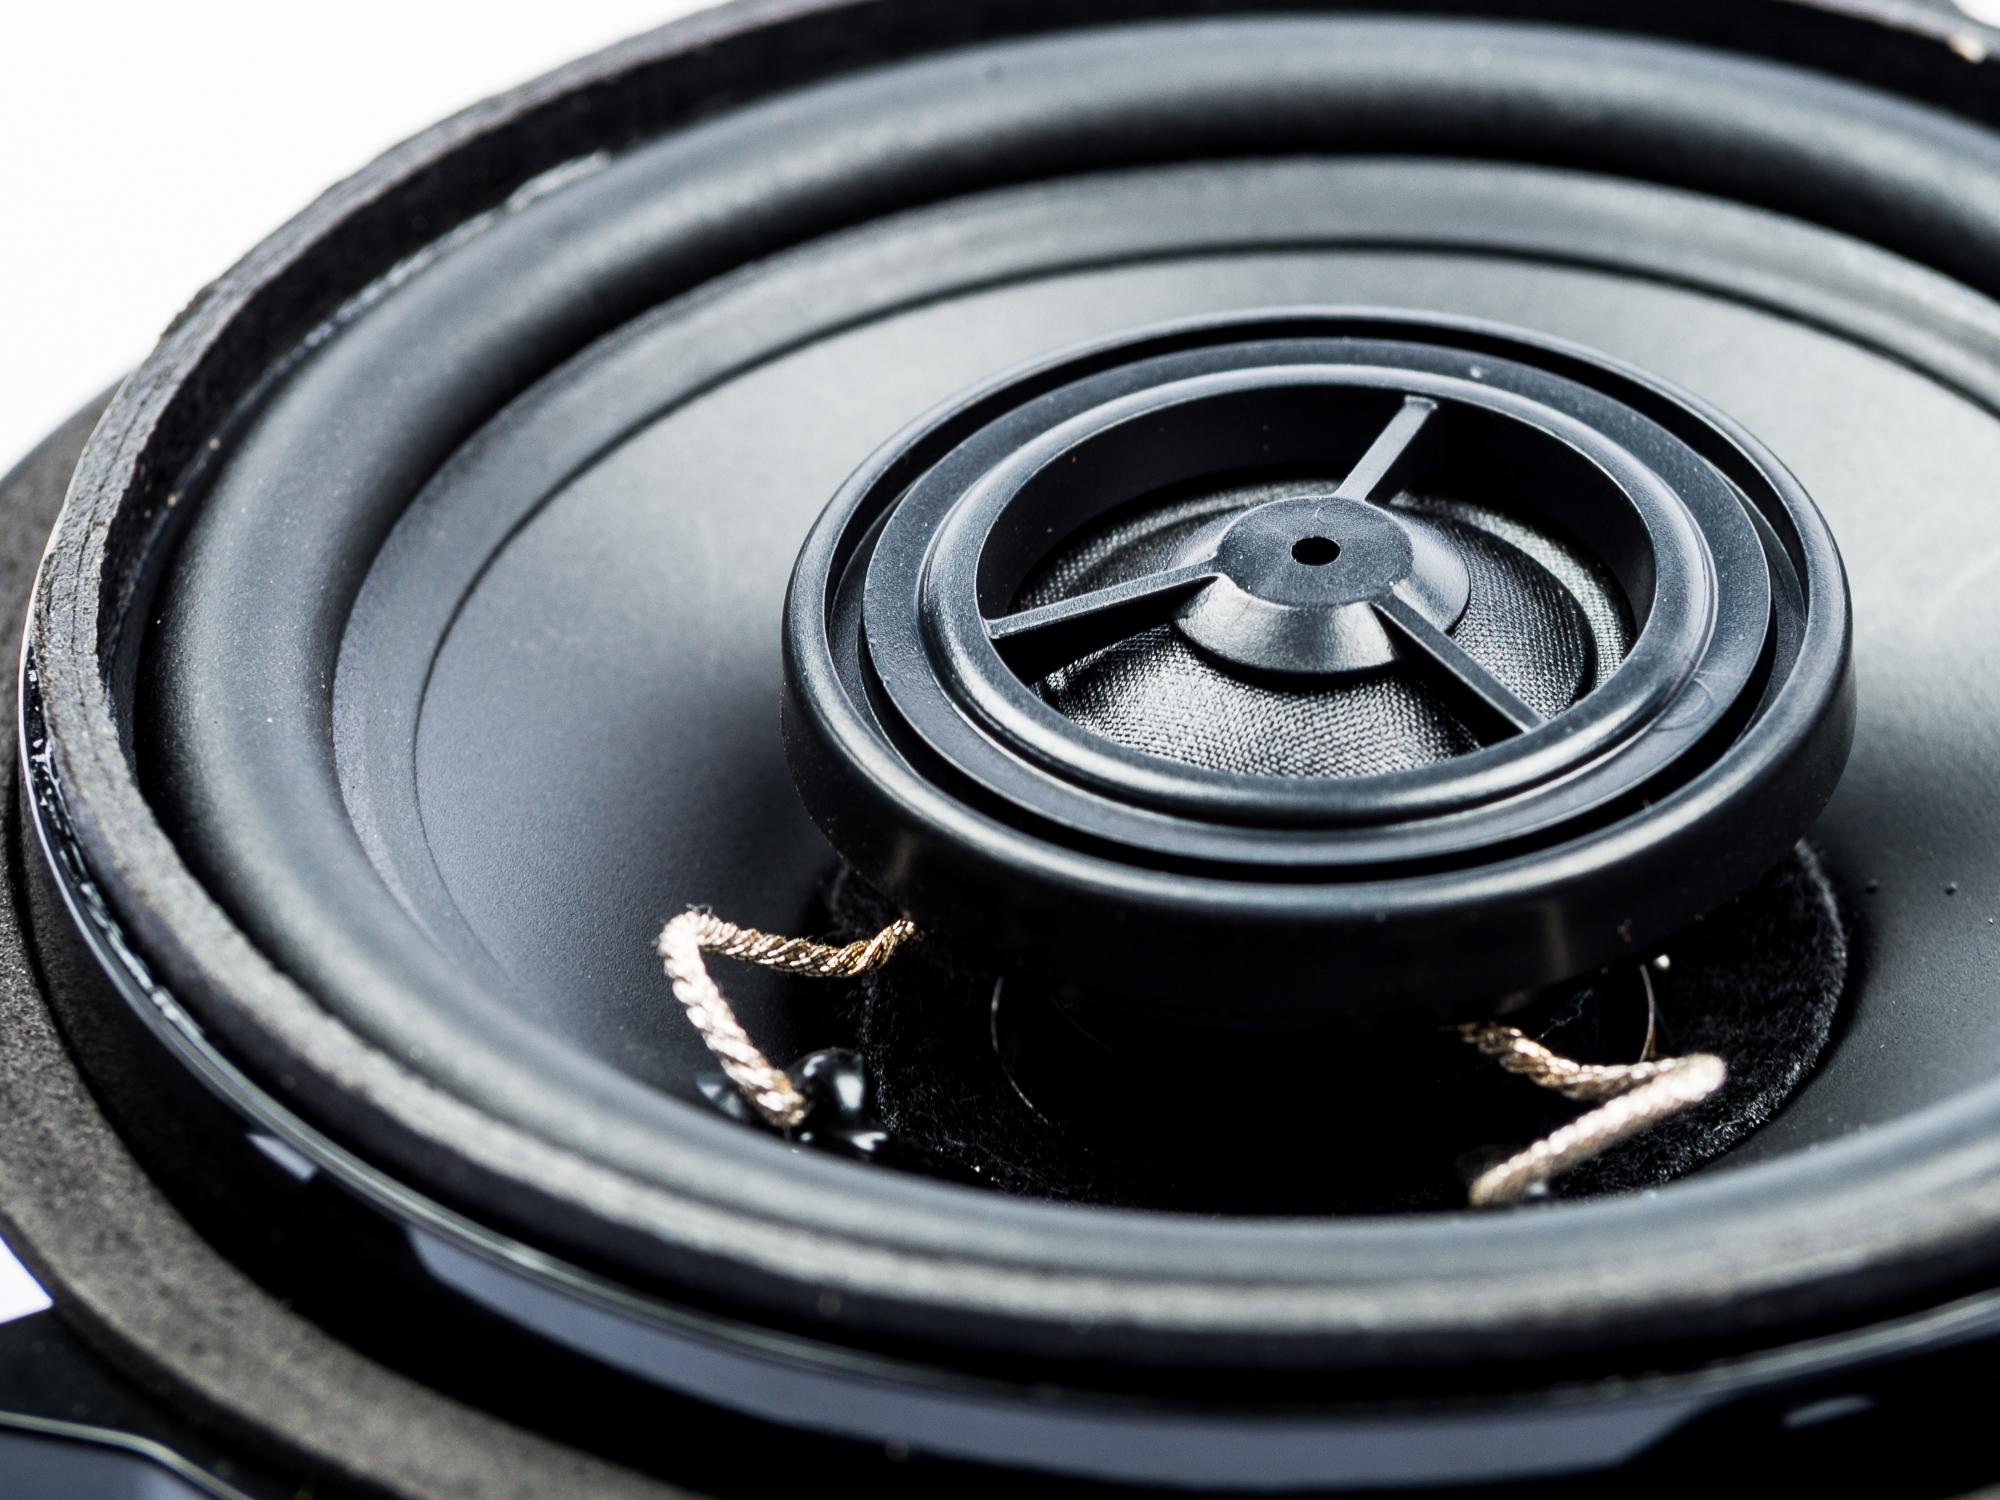 PG Audio BM-4, 10 cm Koaxial Lautsprecher passend für BMW 1er (E81, E82, E87, E88), 3er (E90, E91, E92) 5er (E60, E61), X1 (E84)1 Paar – Bild 4